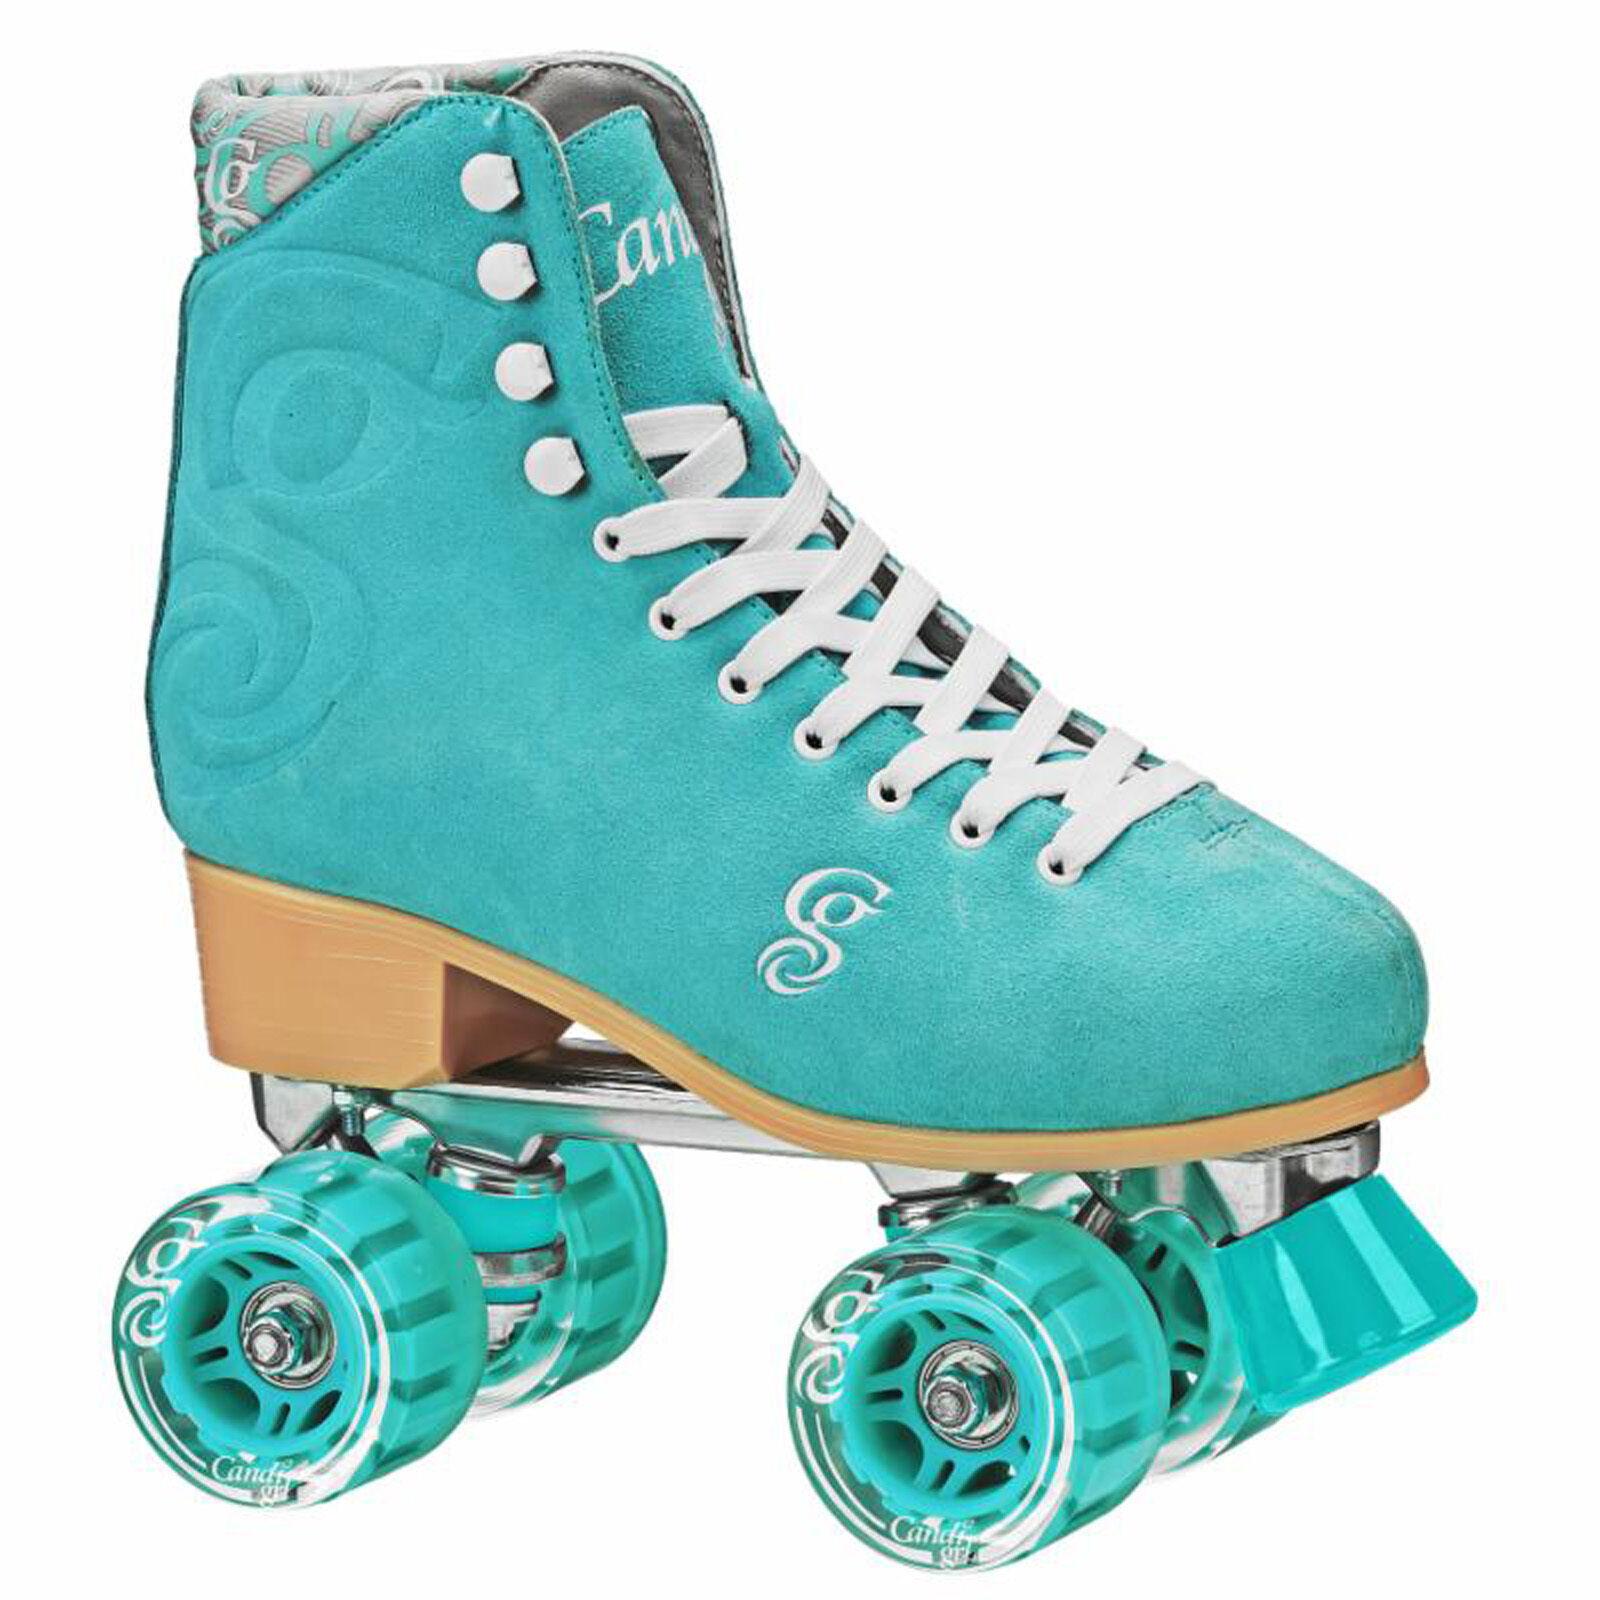 New Candi Girl Carlin Sea Foam Roller Skates Girls Ladies Si